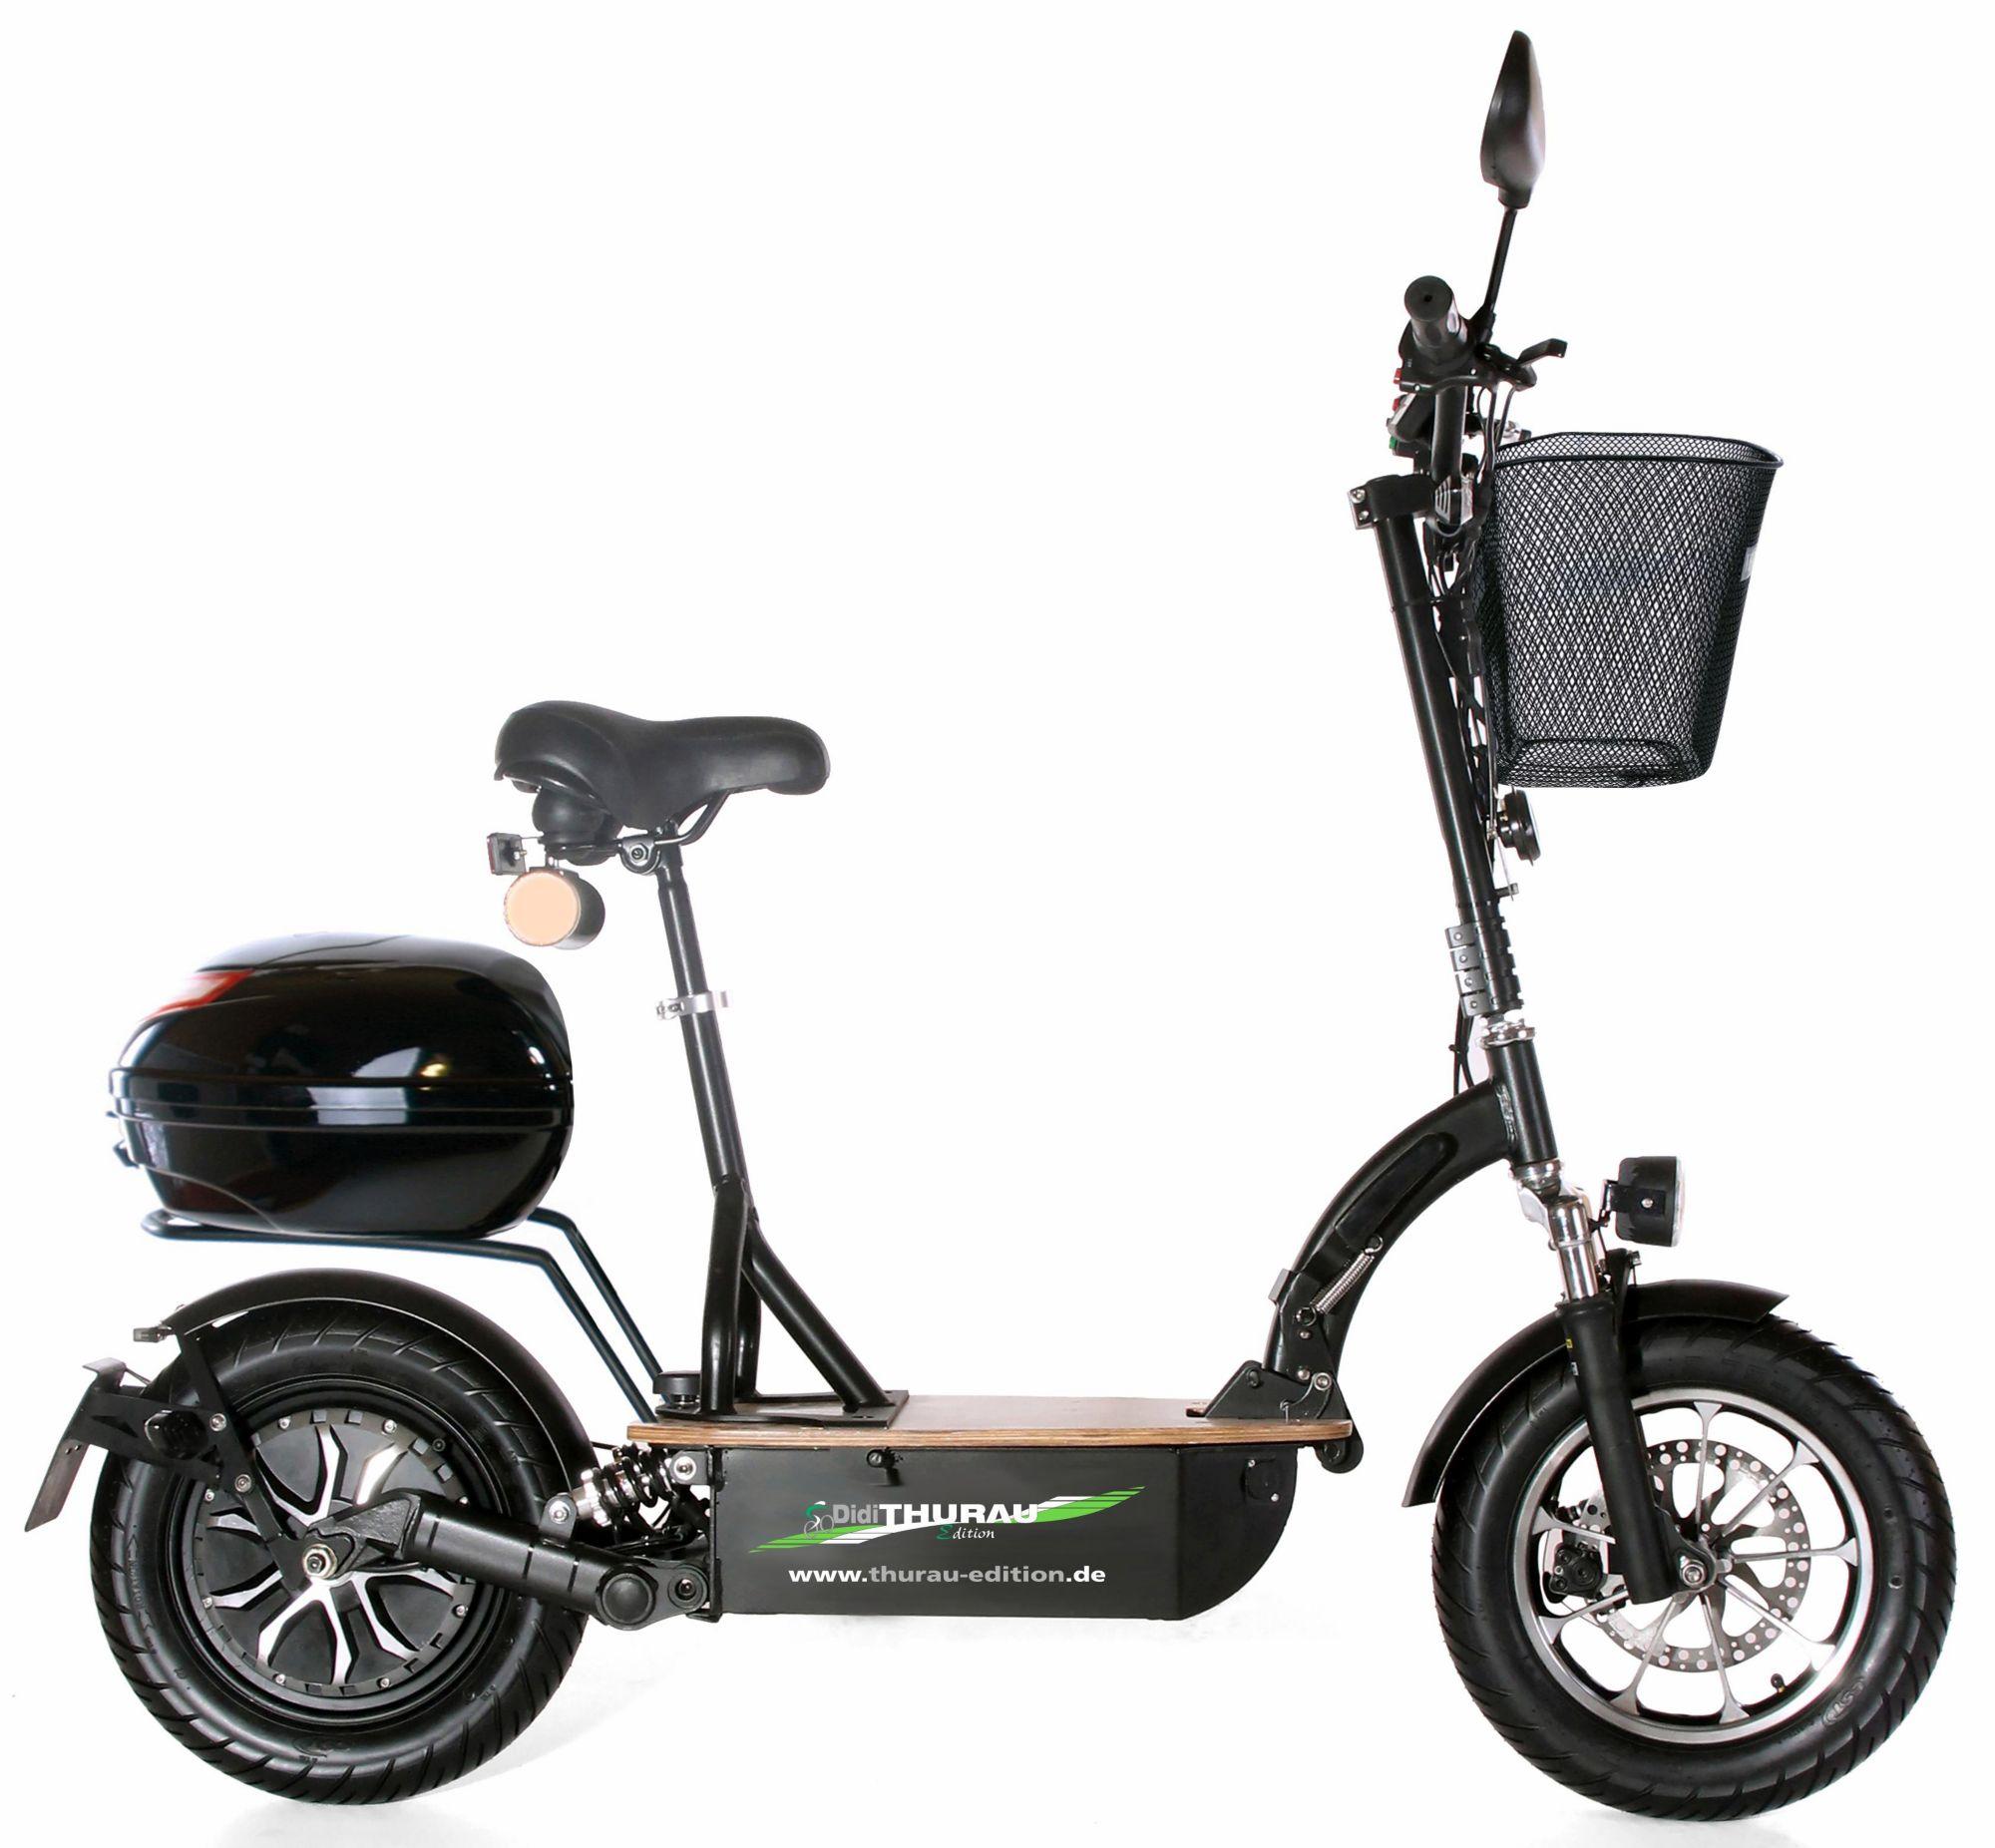 DIDI THURAU EDITION Didi Thurau Edition Elektro-Roller Eco-Tourer, 20 km/h, »Safety Plus«